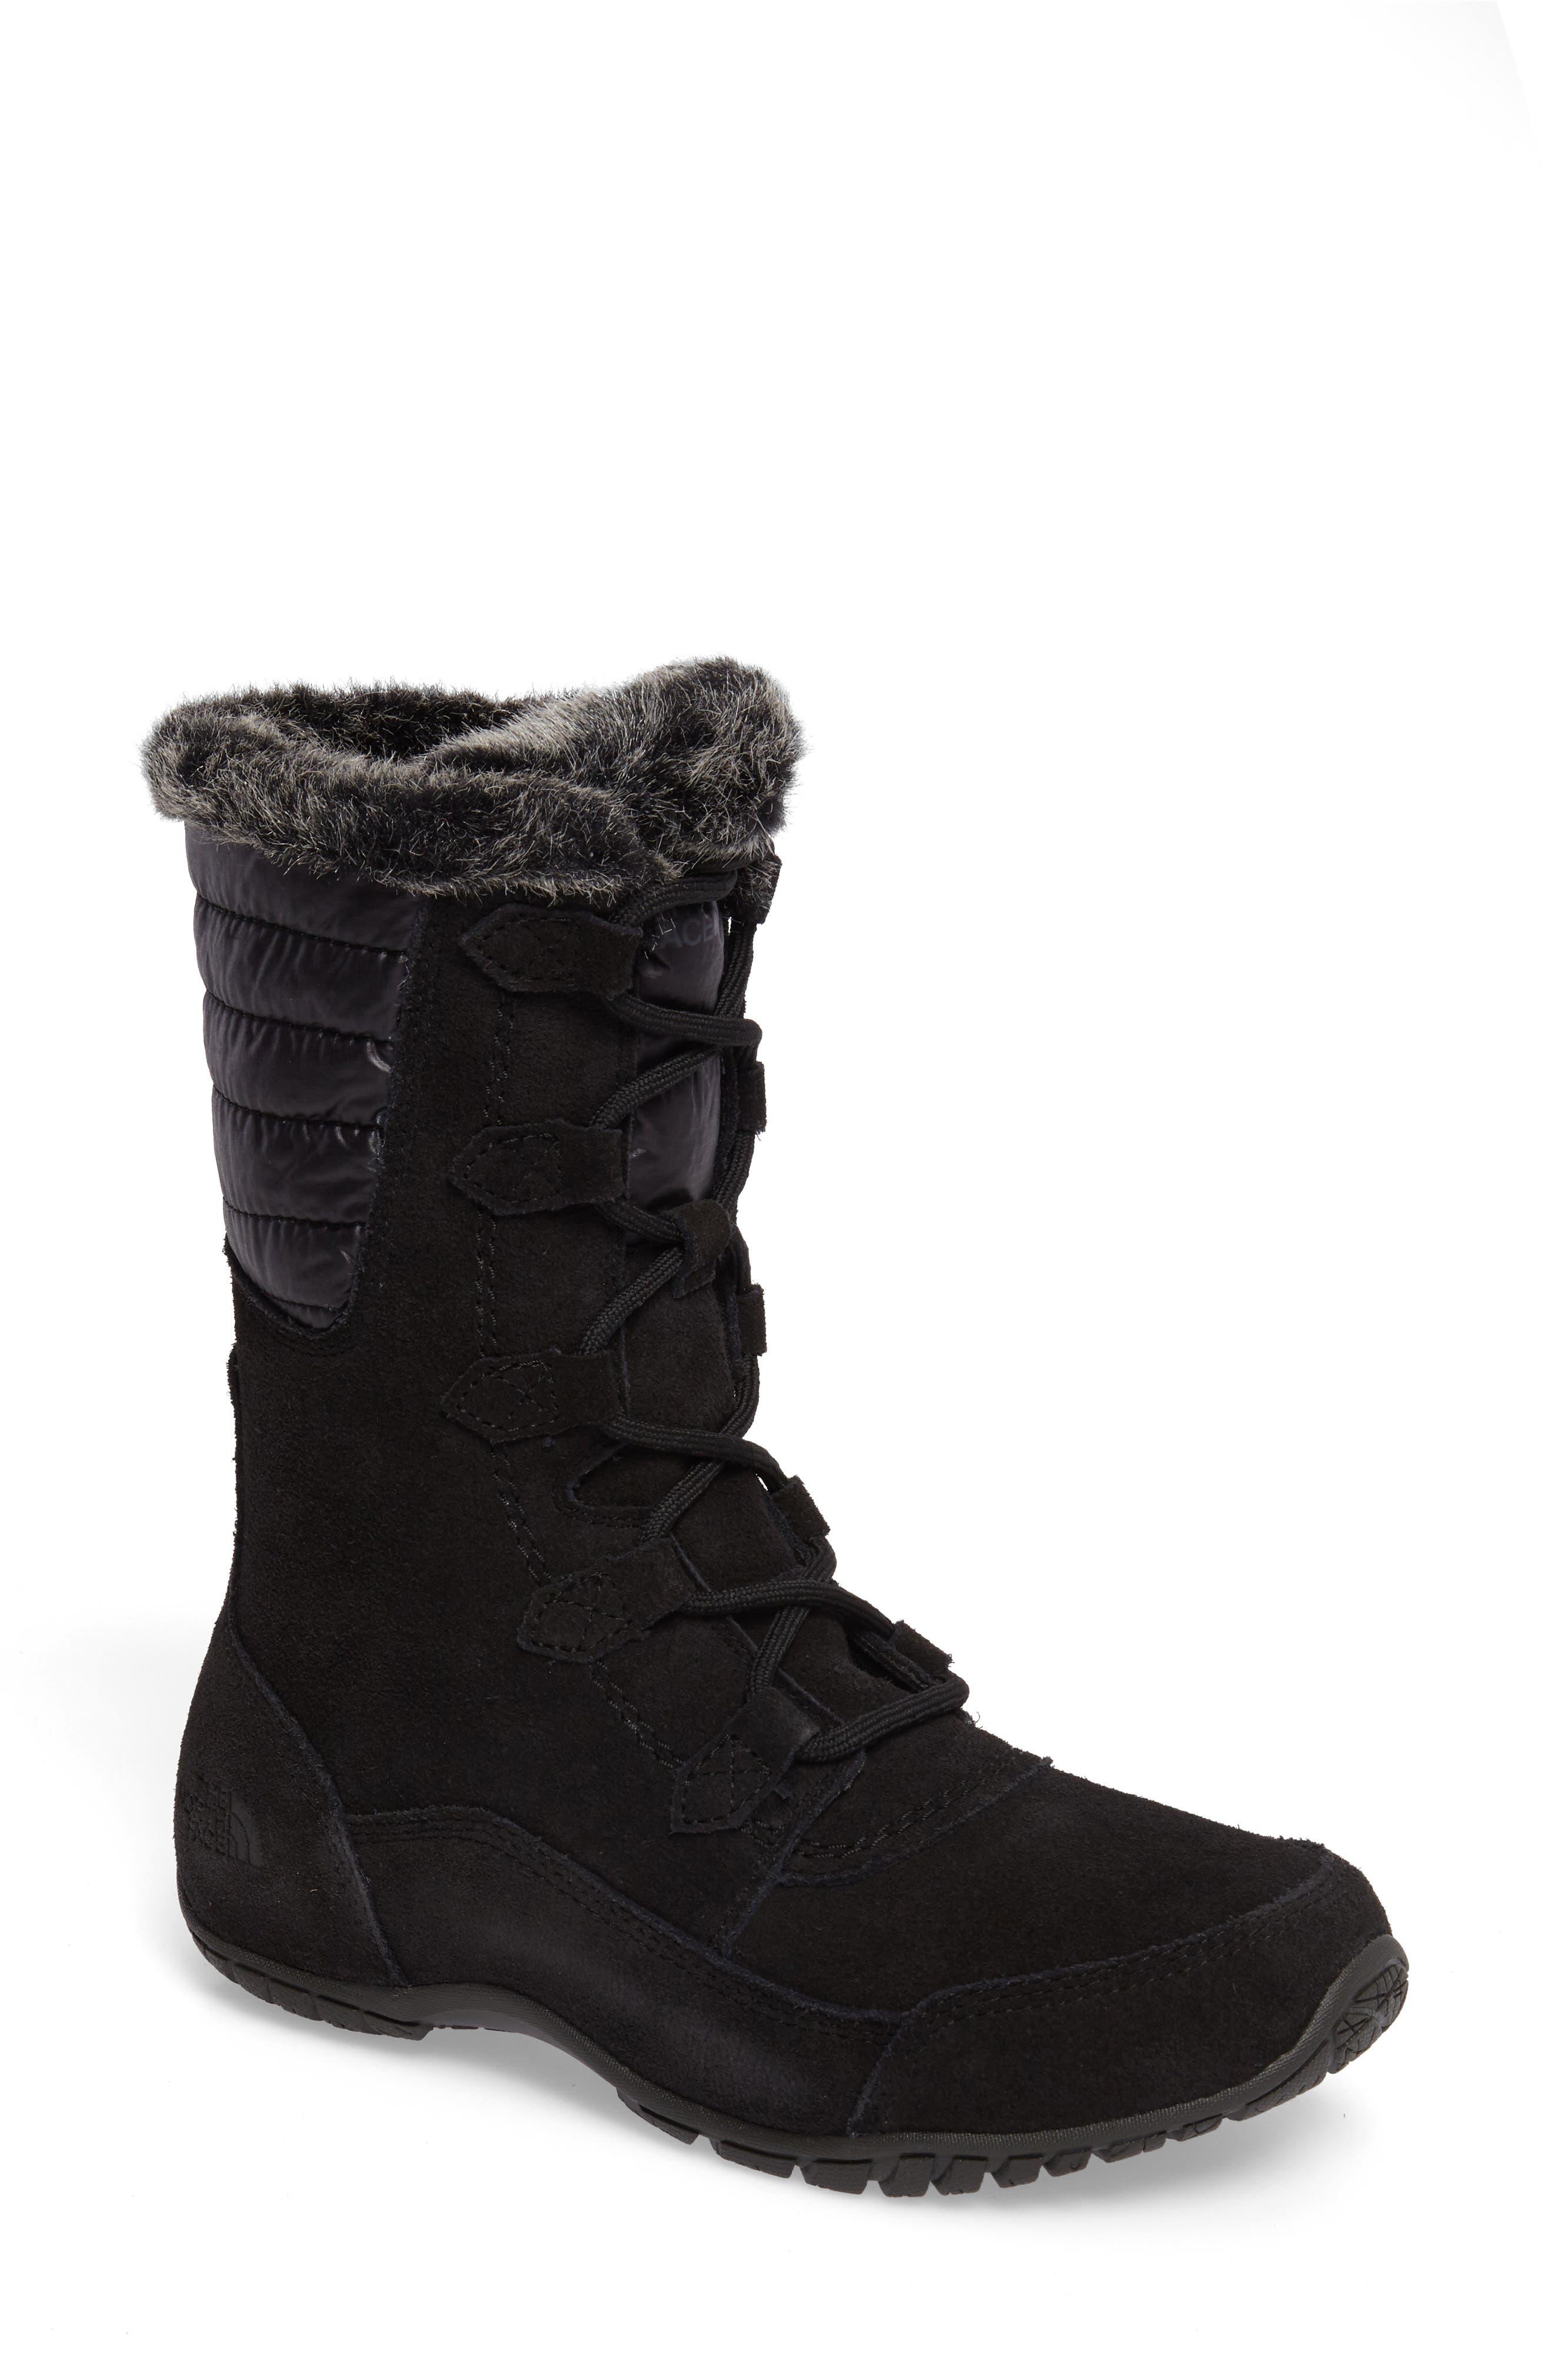 Nuptse Purna II Waterproof PrimaLoft<sup>®</sup> Silver Eco Insulated Winter Boot,                         Main,                         color, Tnf Black/ Beluga Grey